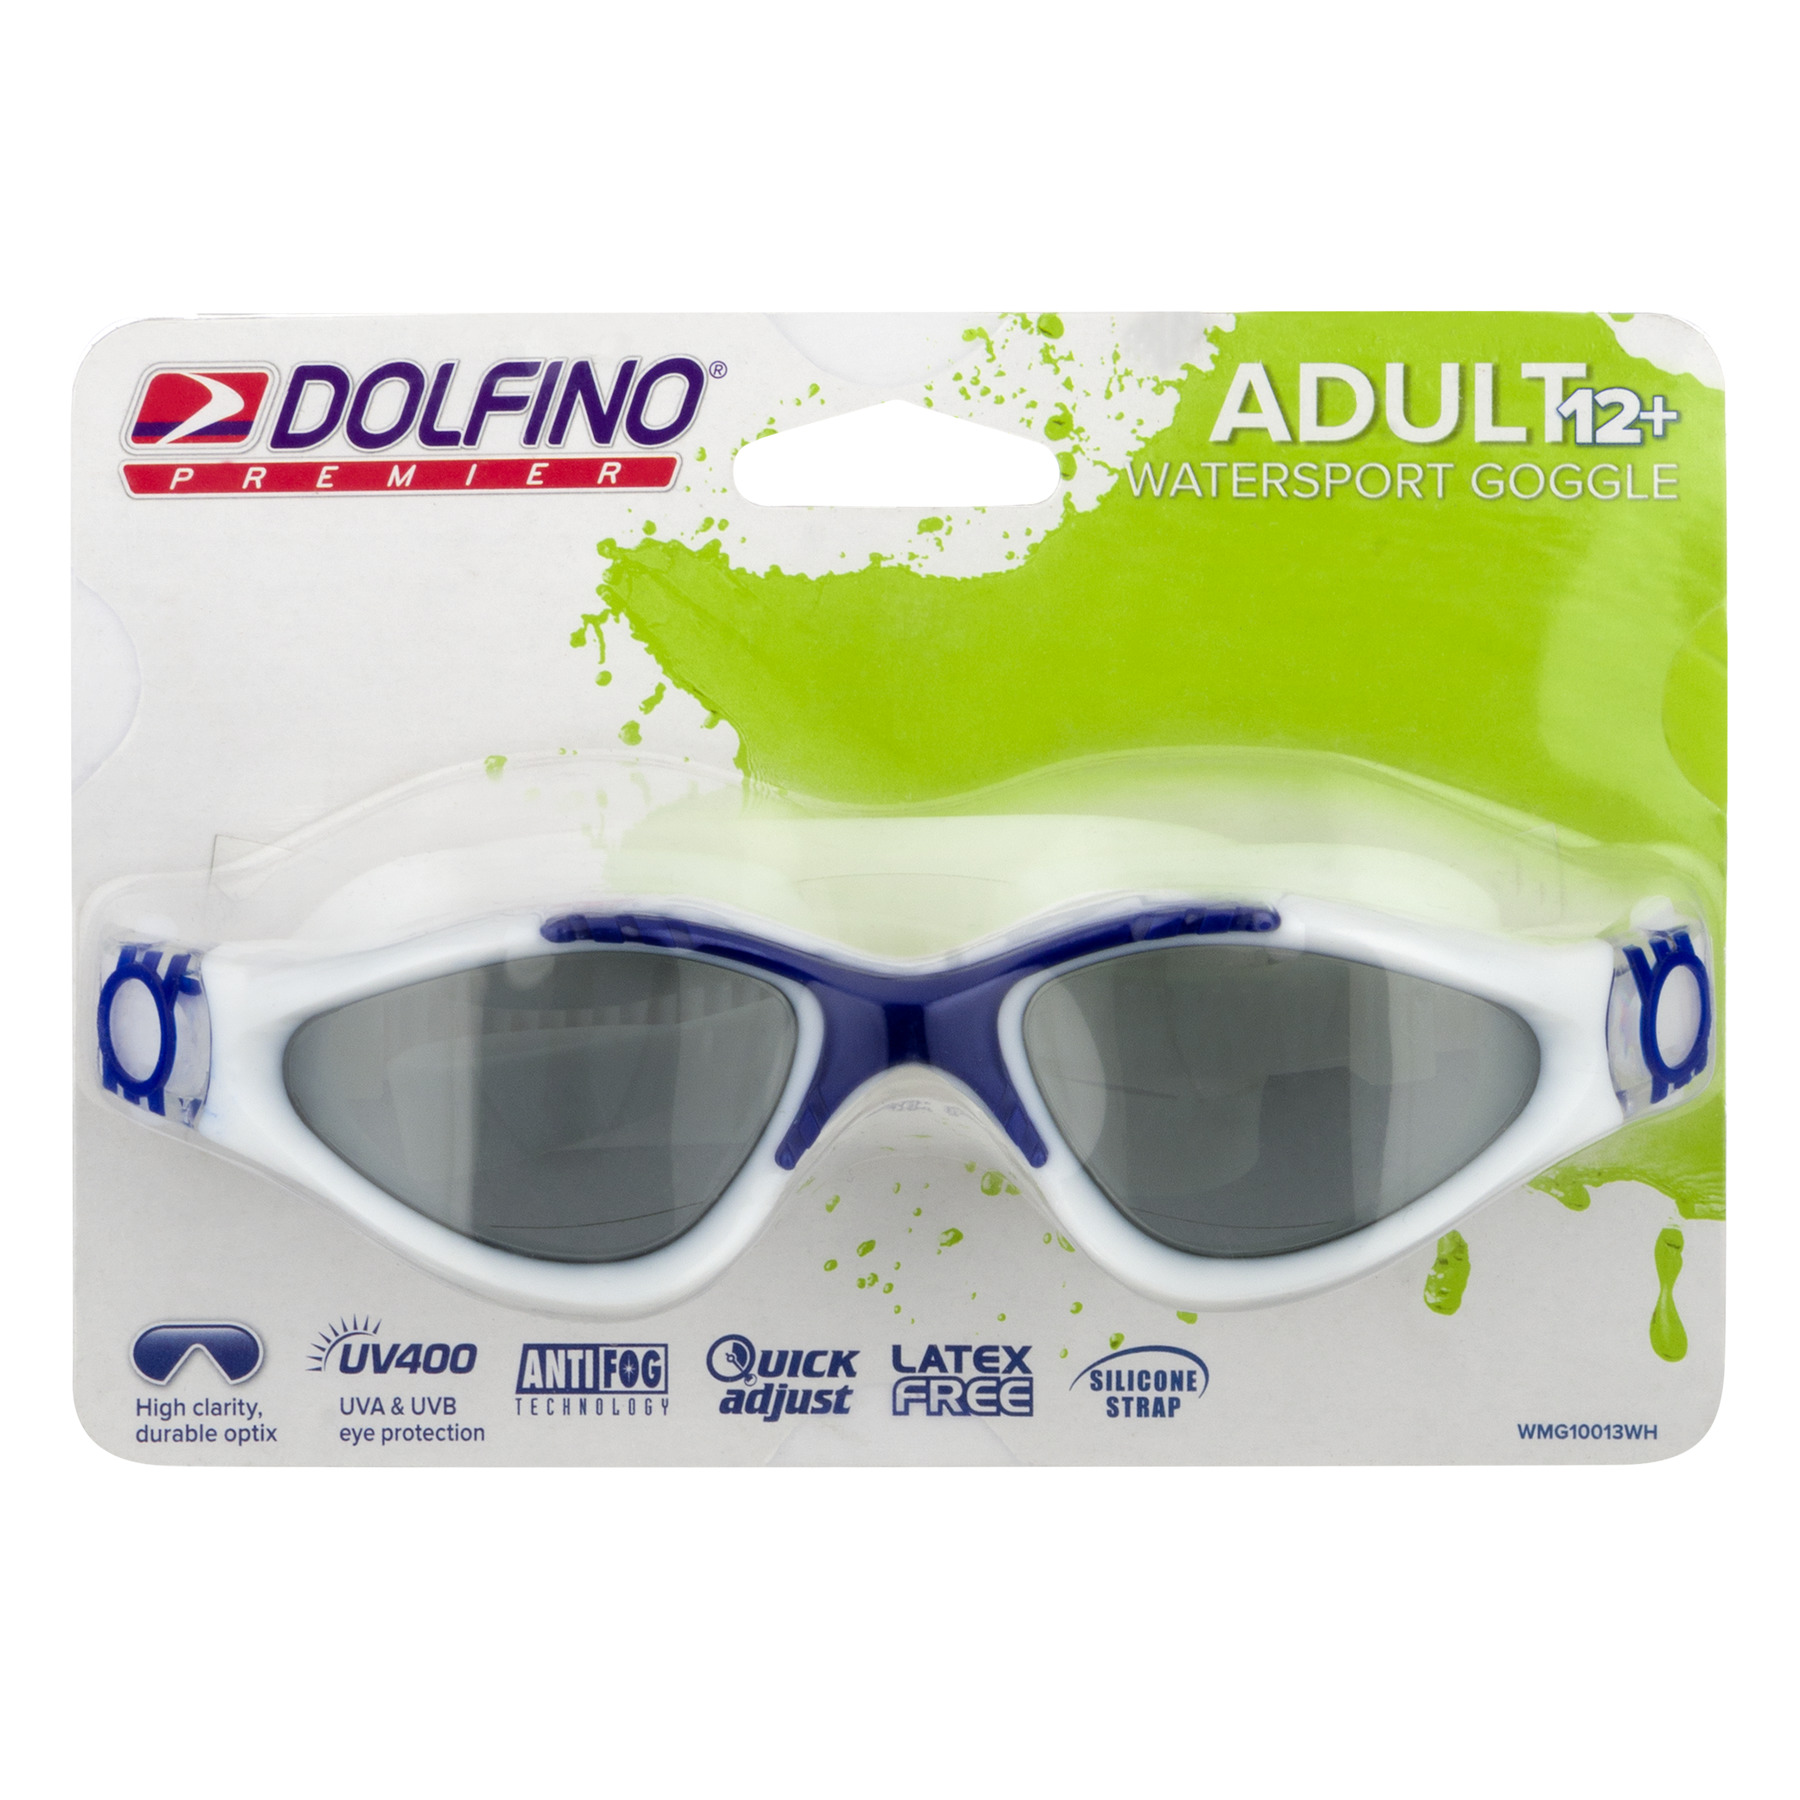 Dolfino Premier Adult Watersport Goggle, 1.0 PR